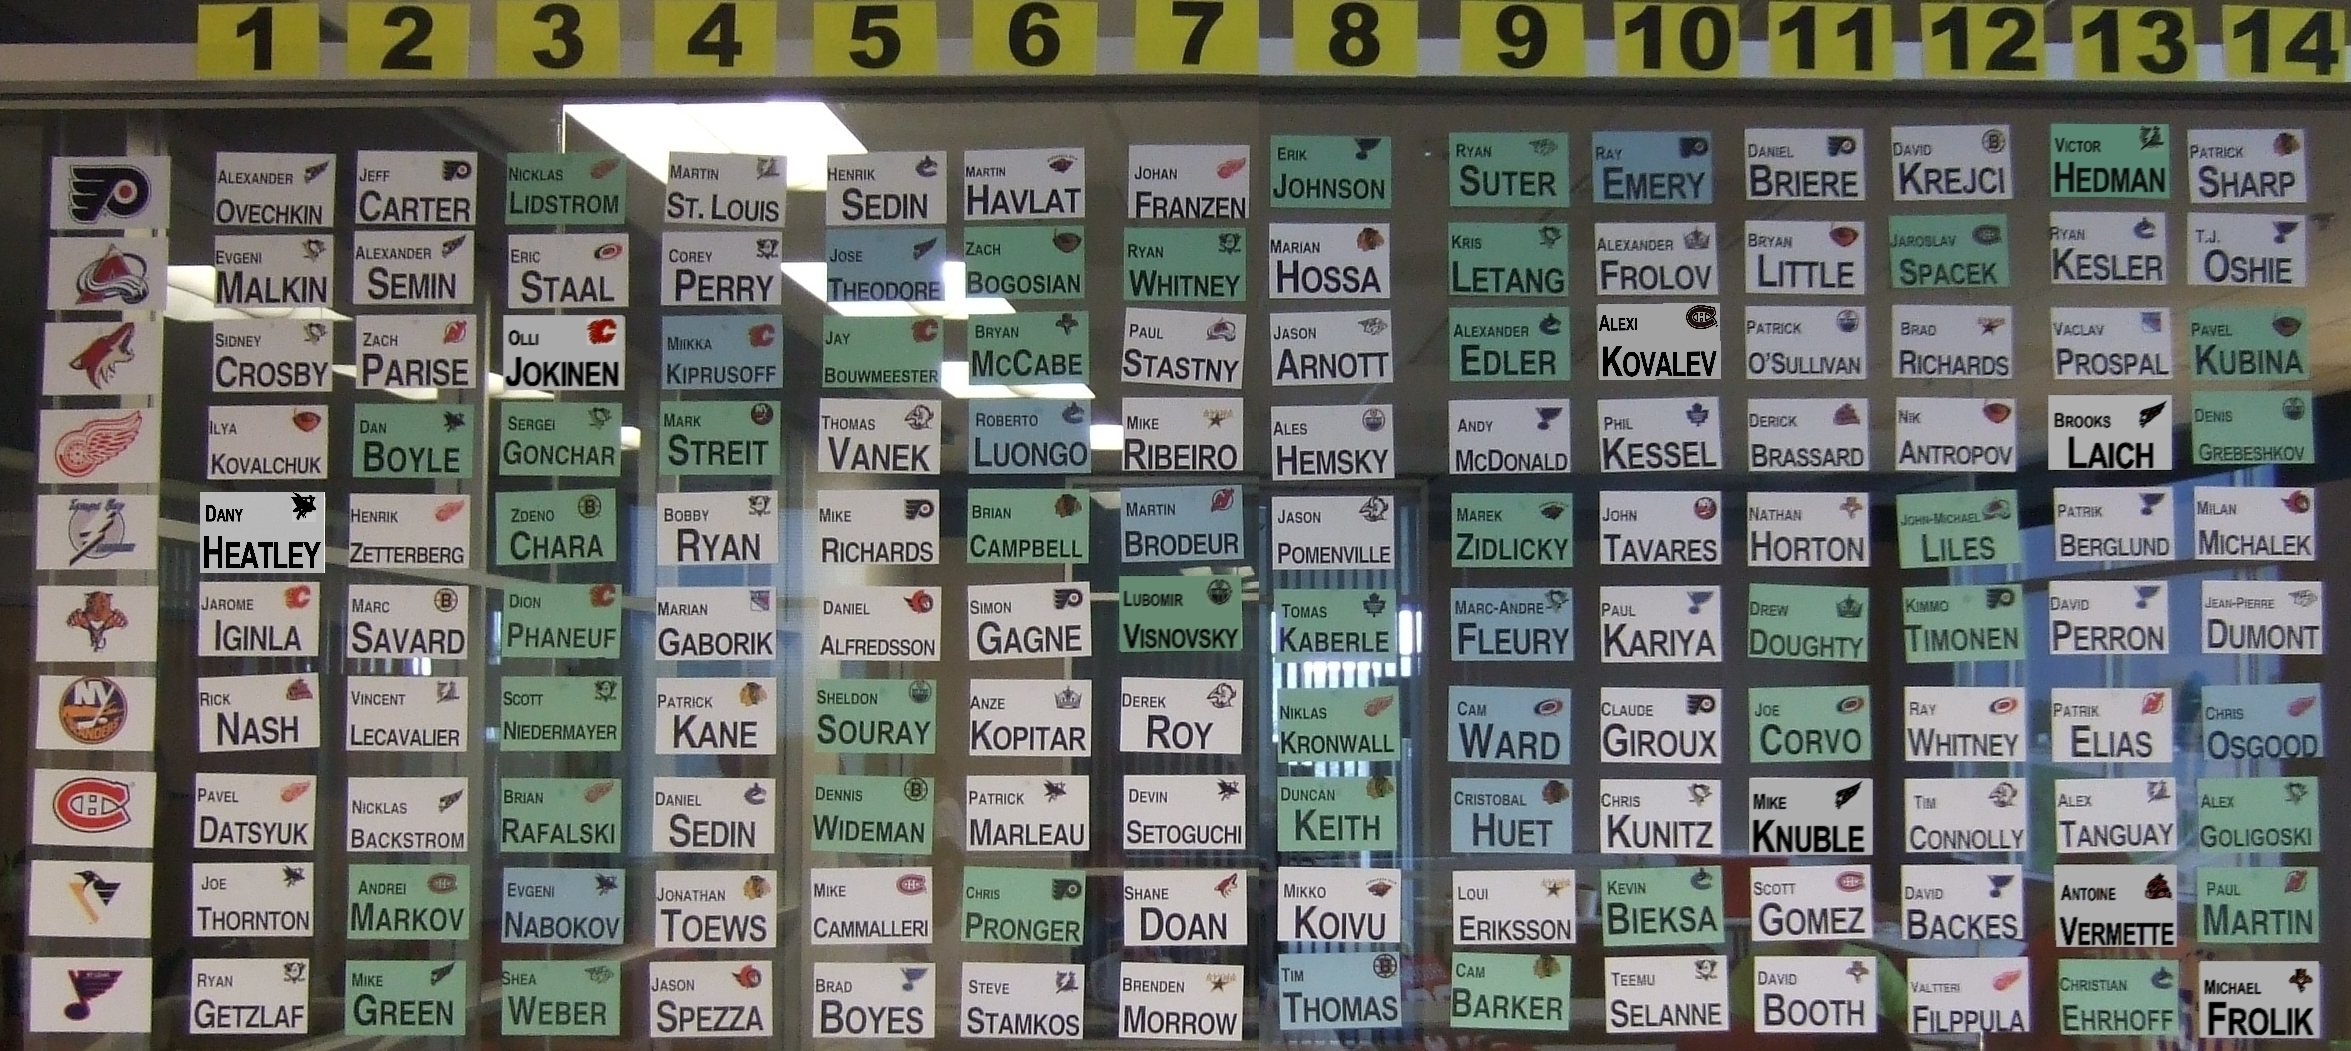 2009 Draft Board